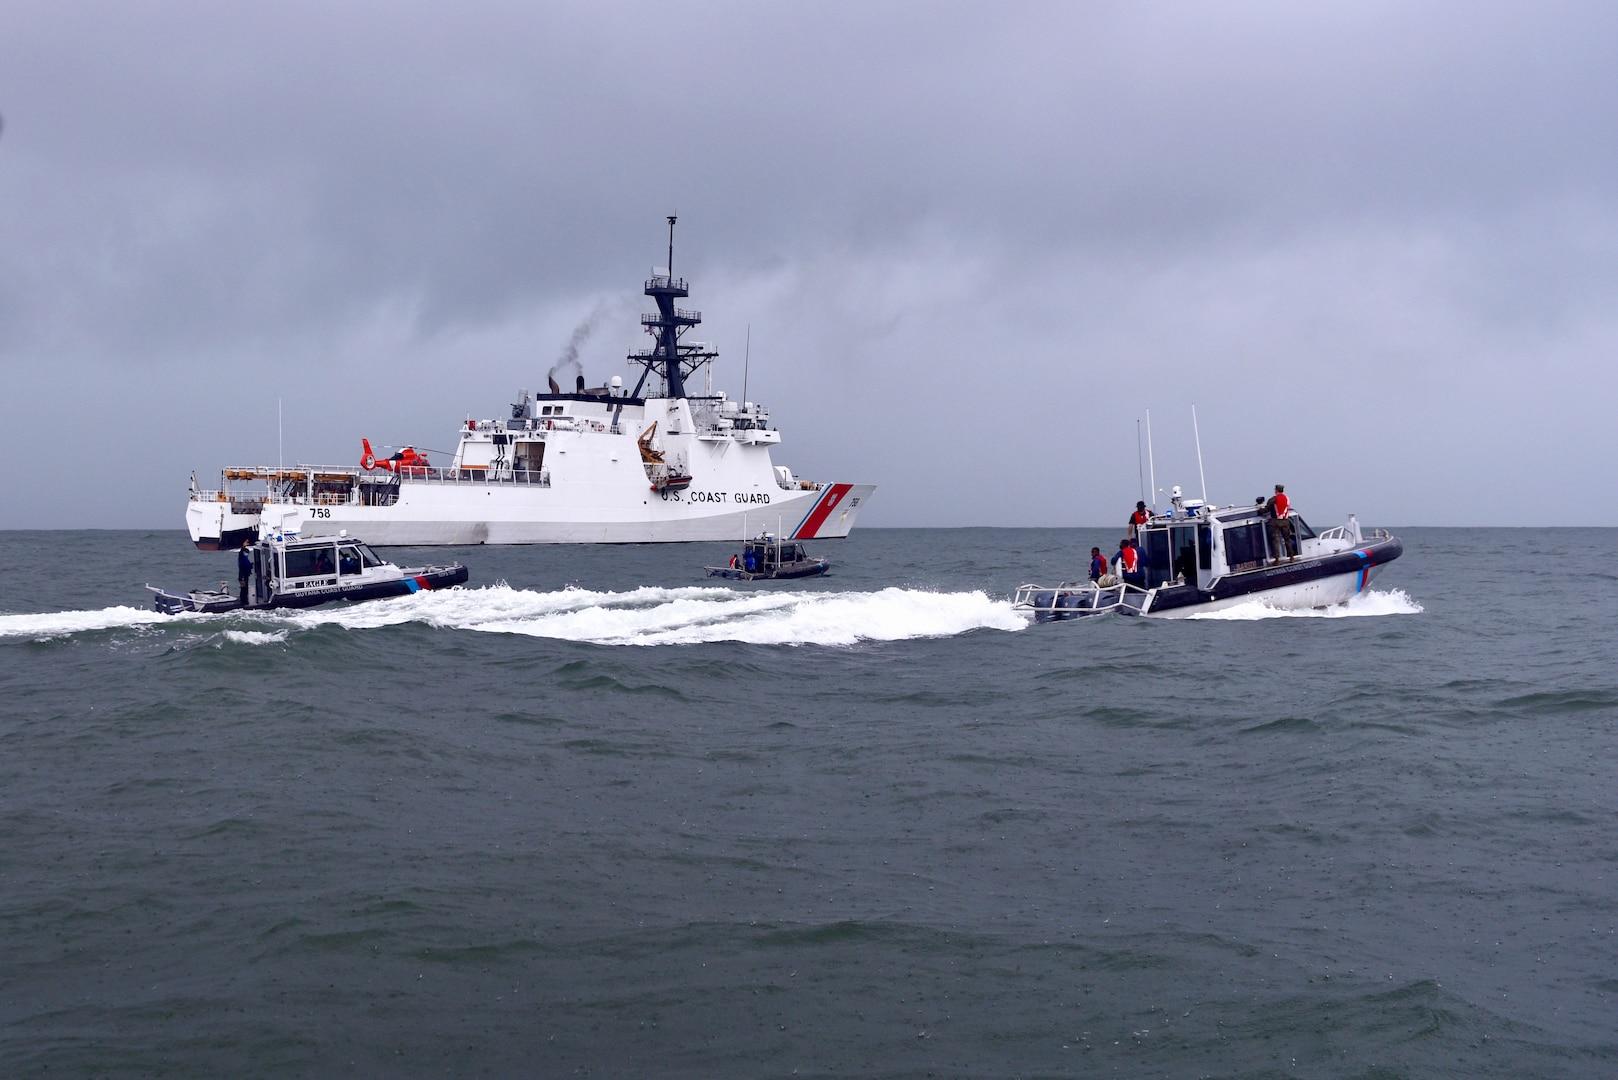 Guyana coast guard small boats patrol alongside the USCGC Stone (WMSL 758) off Guyana's coast on Jan. 9, 2021.